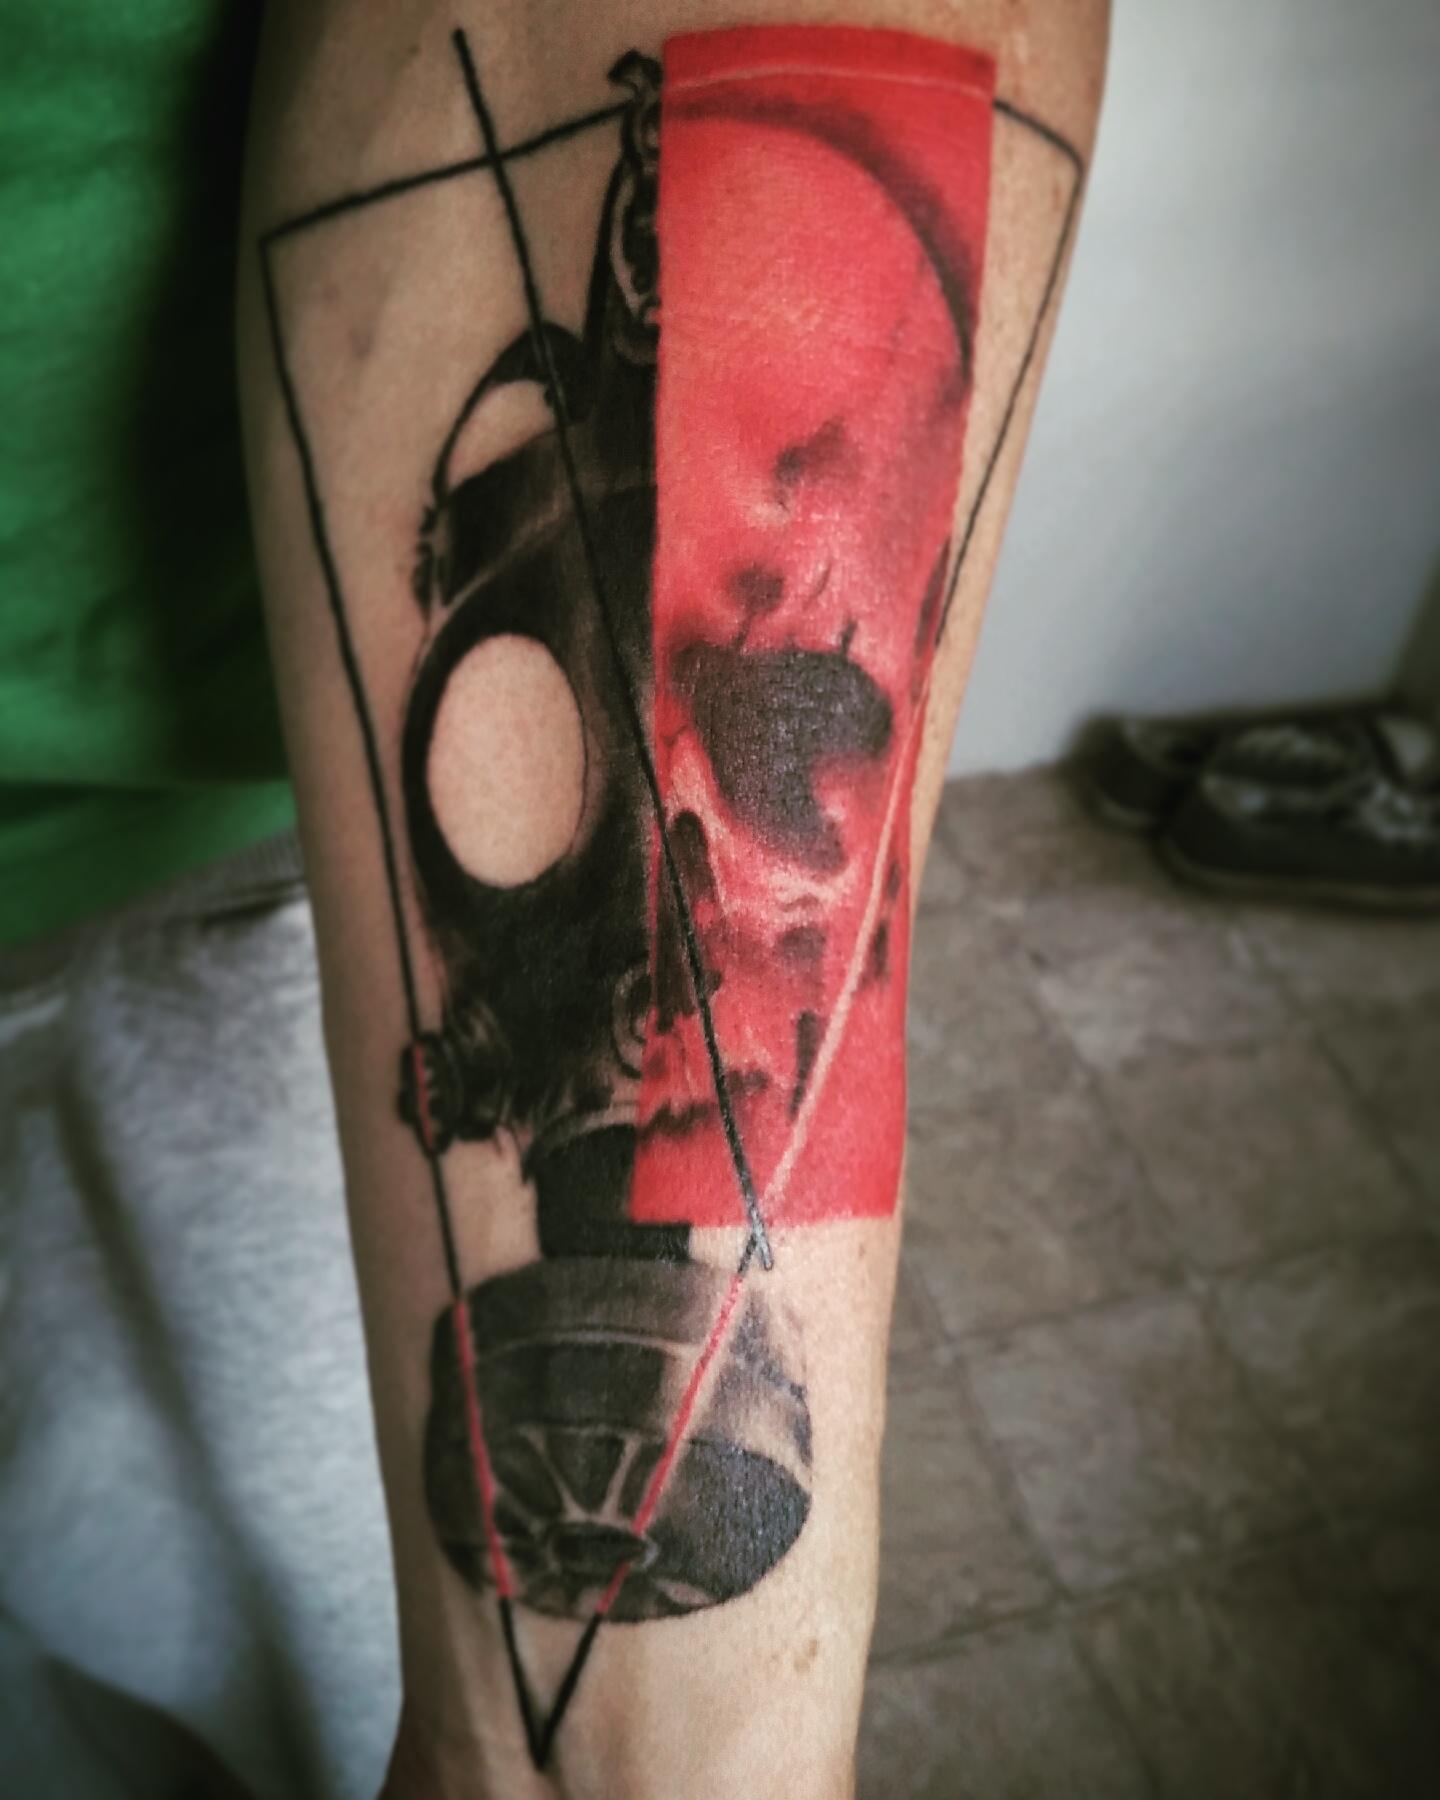 greg's gasmask tattoo